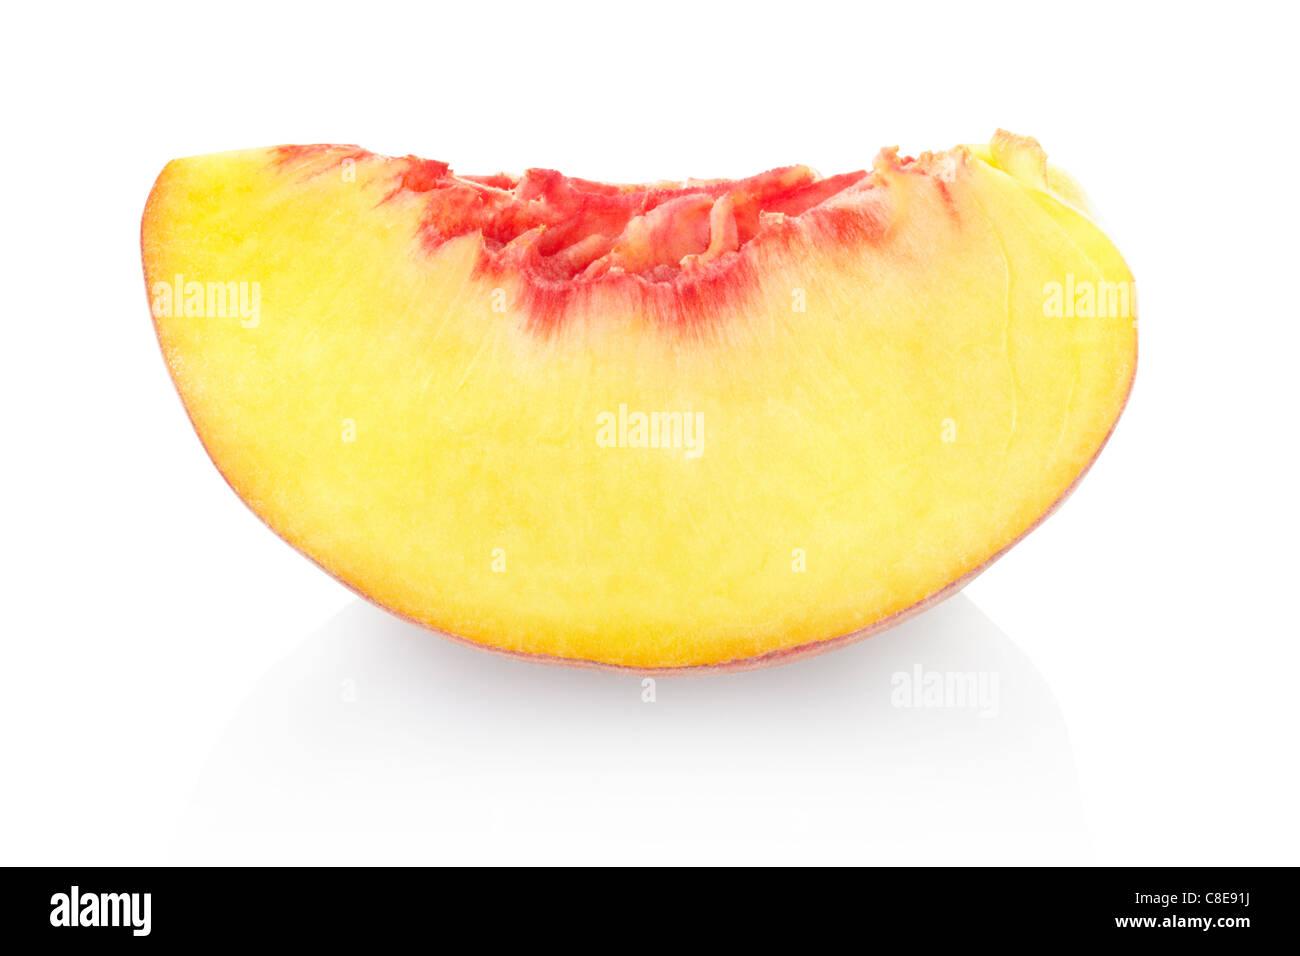 Peach slice - Stock Image